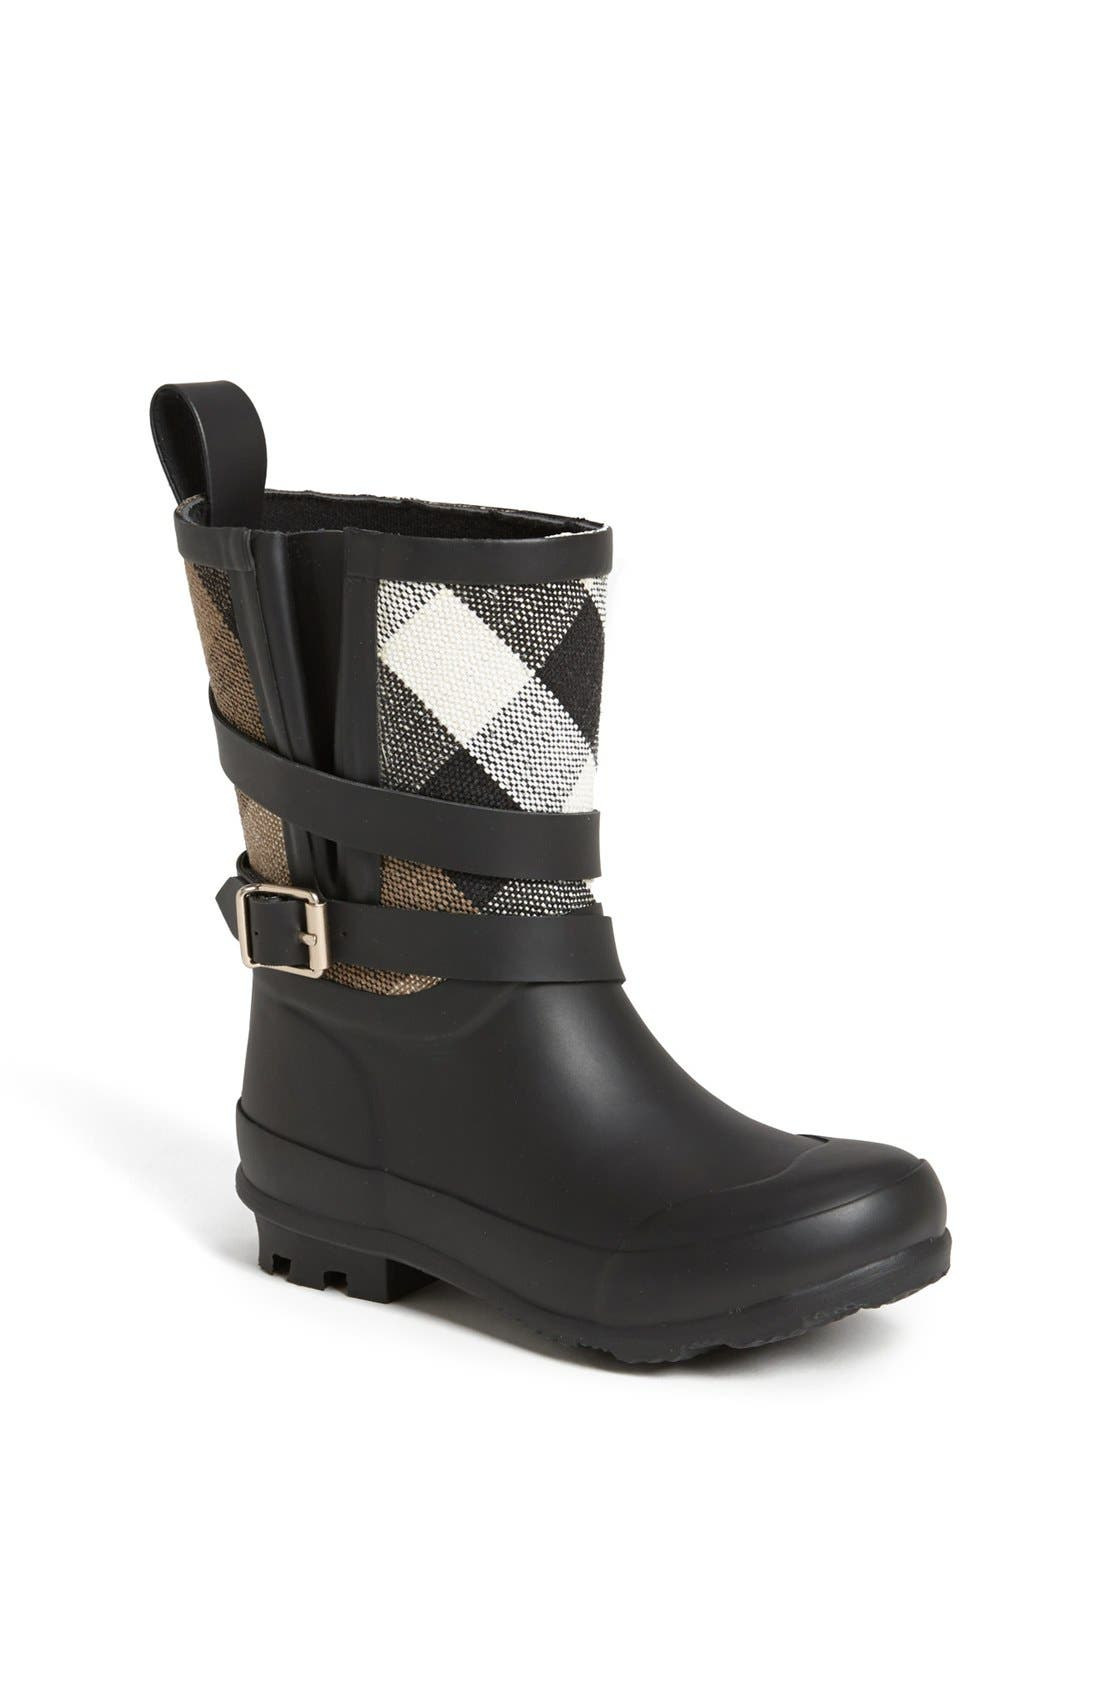 BURBERRY 'Holloway' Rain Boot, Main, color, 001